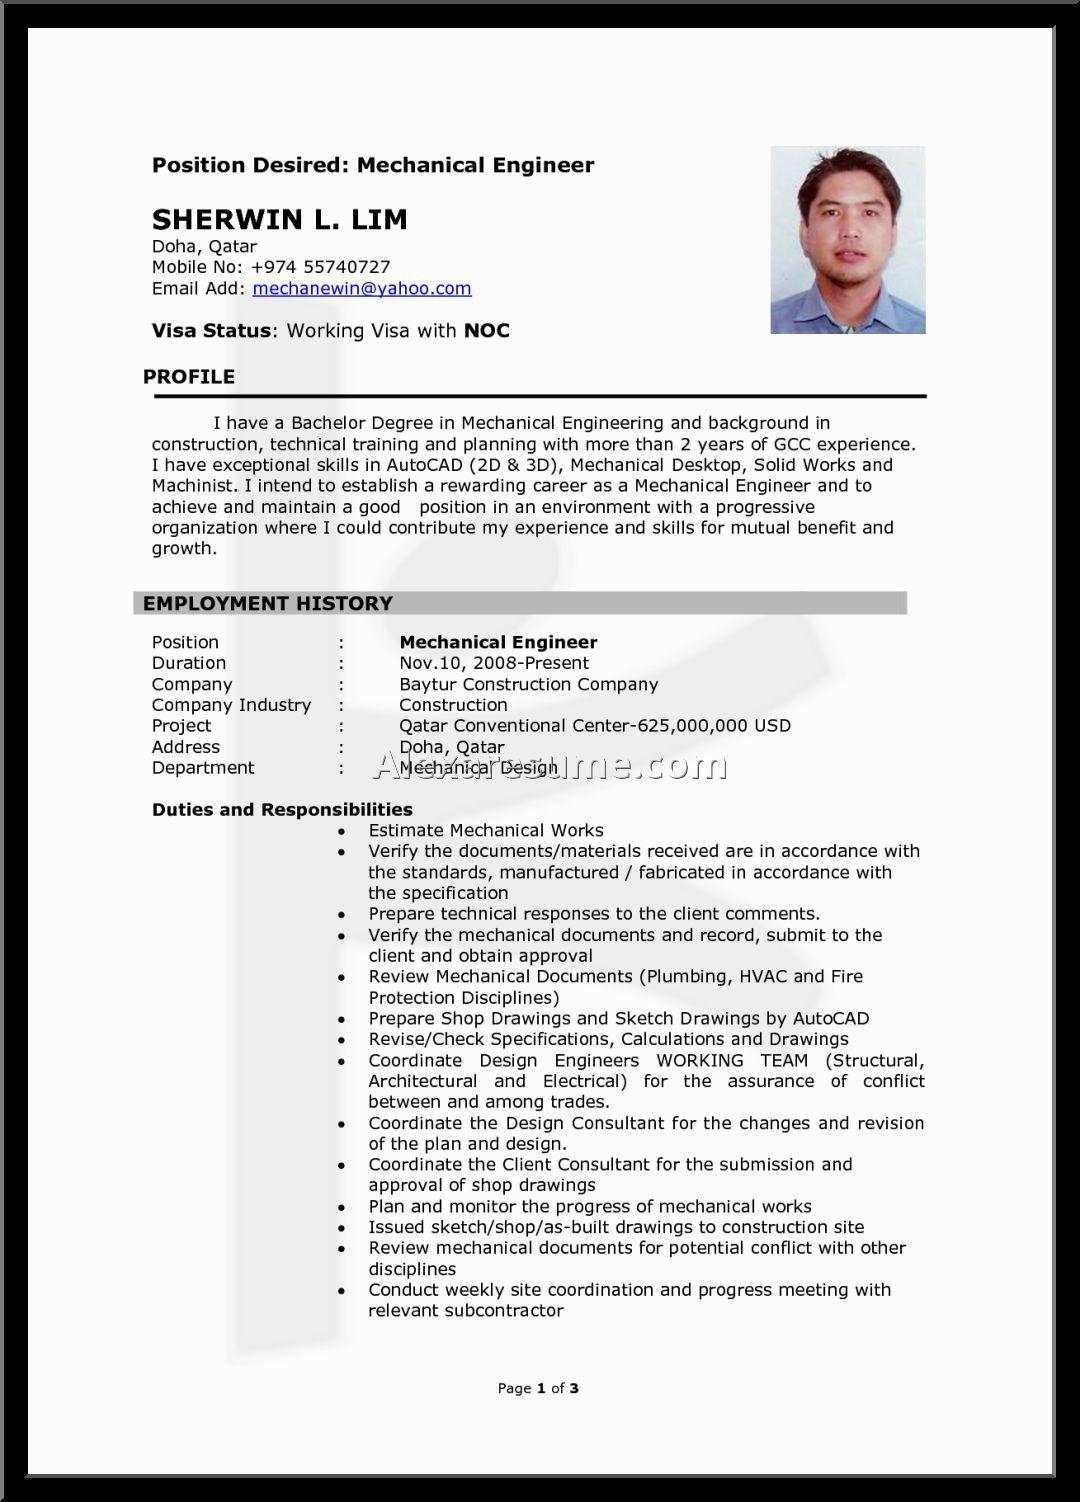 A C Technician Resume Format Resume Templates Resume Format Job Resume Format Resume